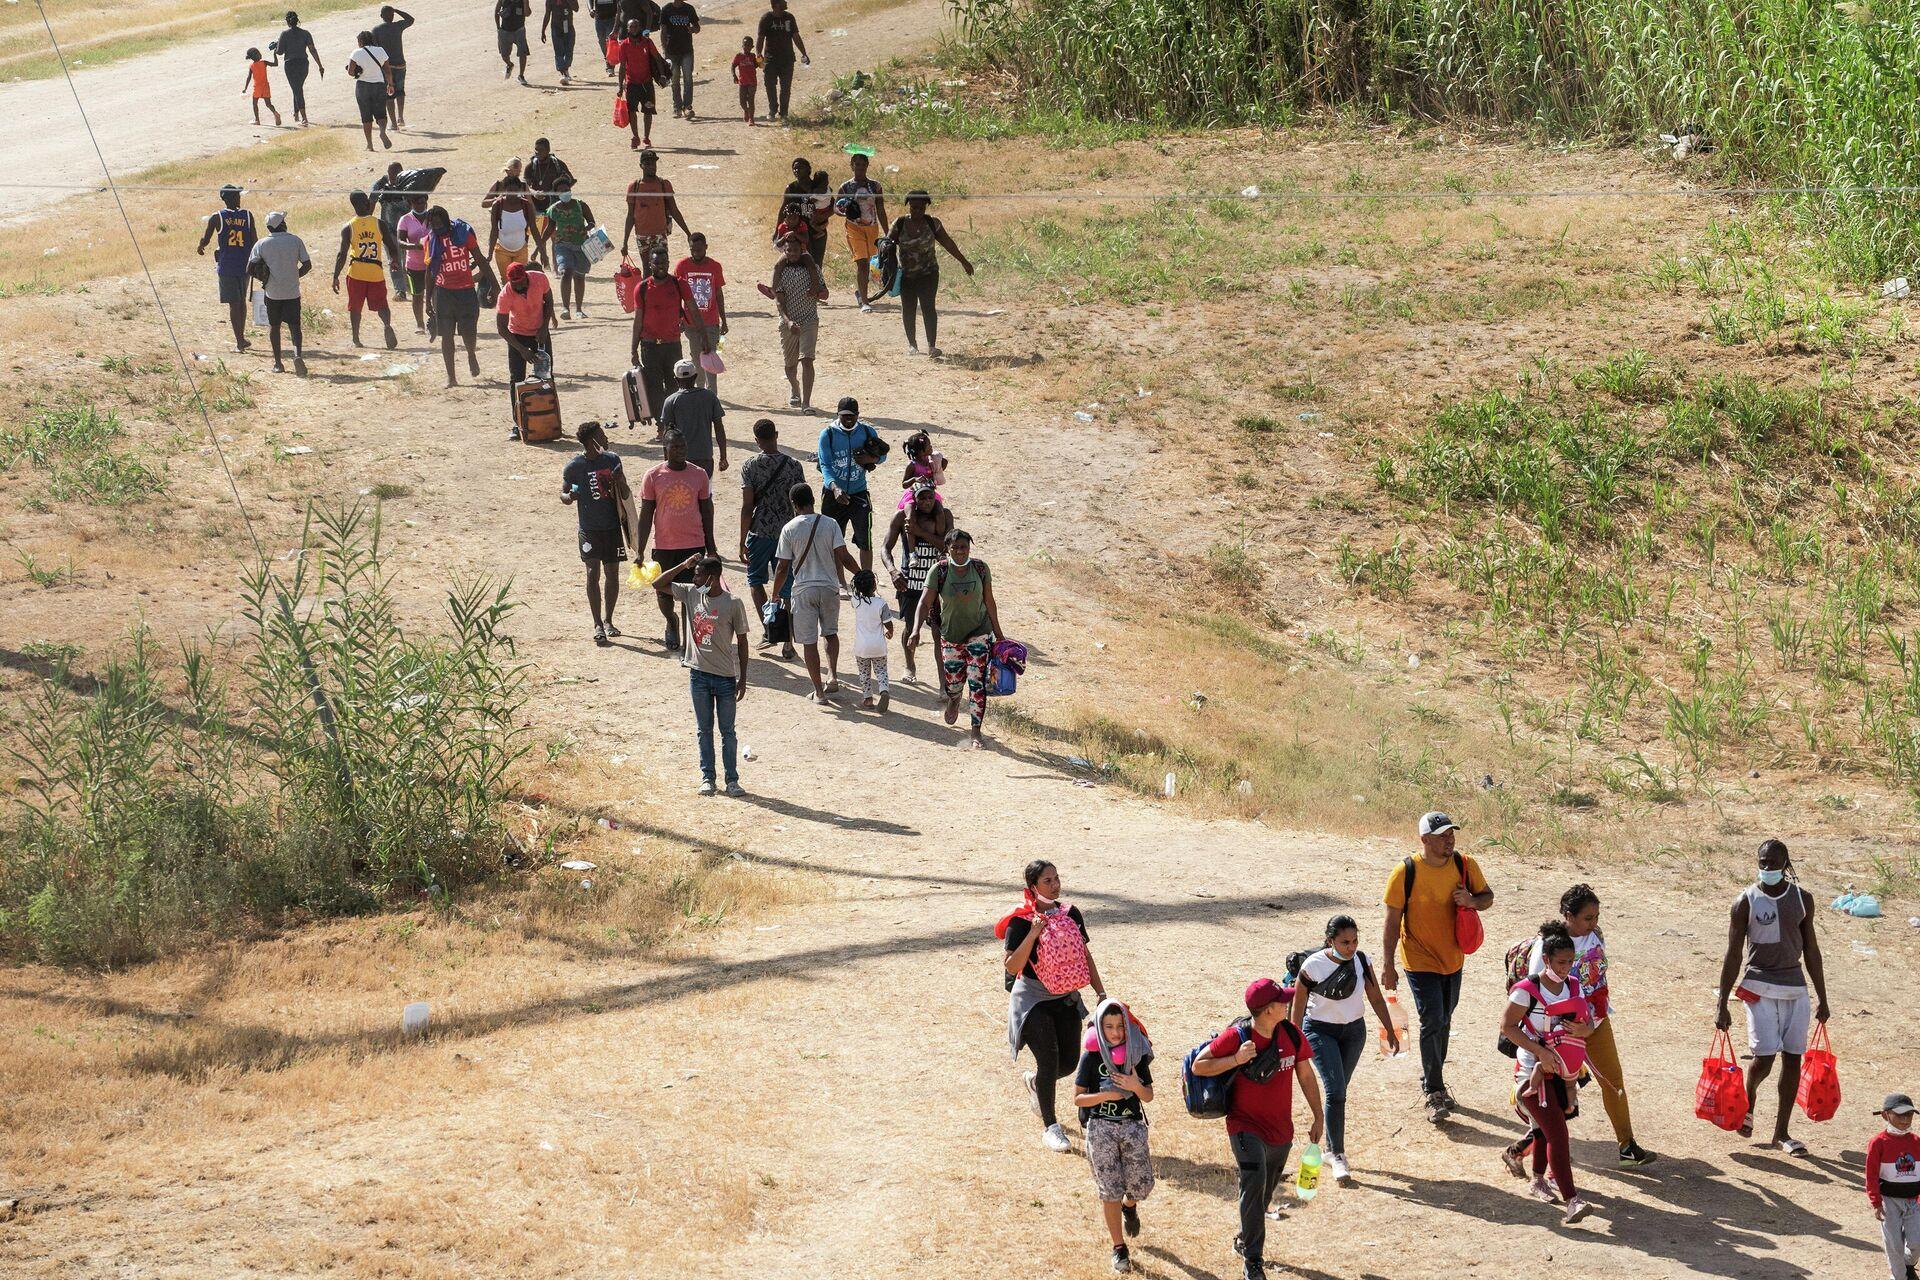 Asylum-seeking migrants walk near the International Bridge between Mexico and the US where asylum-seeking migrants are waiting to be processed in Del Rio, Texas, US, September 15, 2021 - Sputnik International, 1920, 25.09.2021